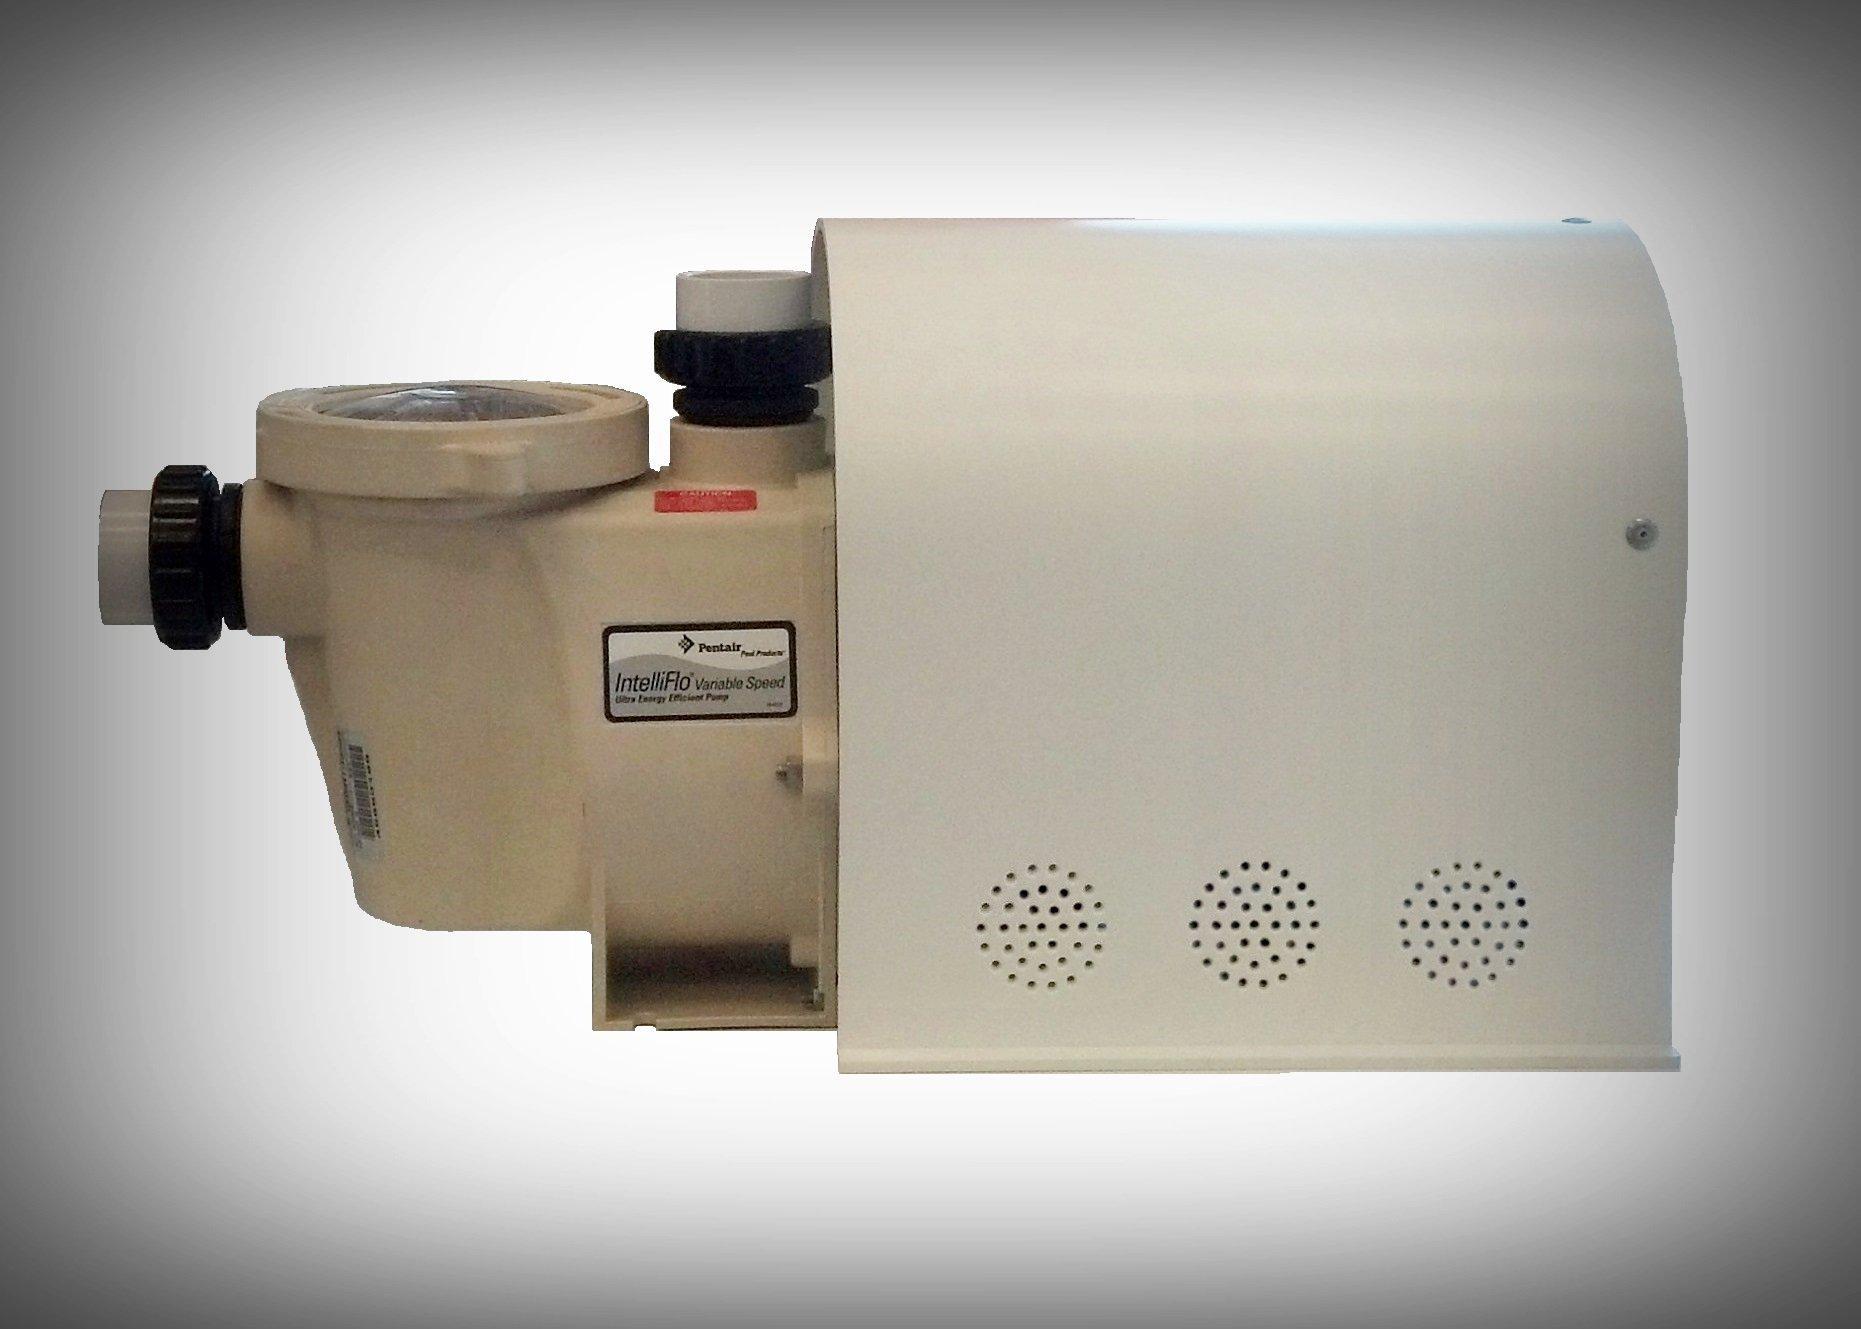 Pentair Intelliflo Pump Motor Cover - Variable Speed Pool Pump Motor/Drive Cover - Outdoor